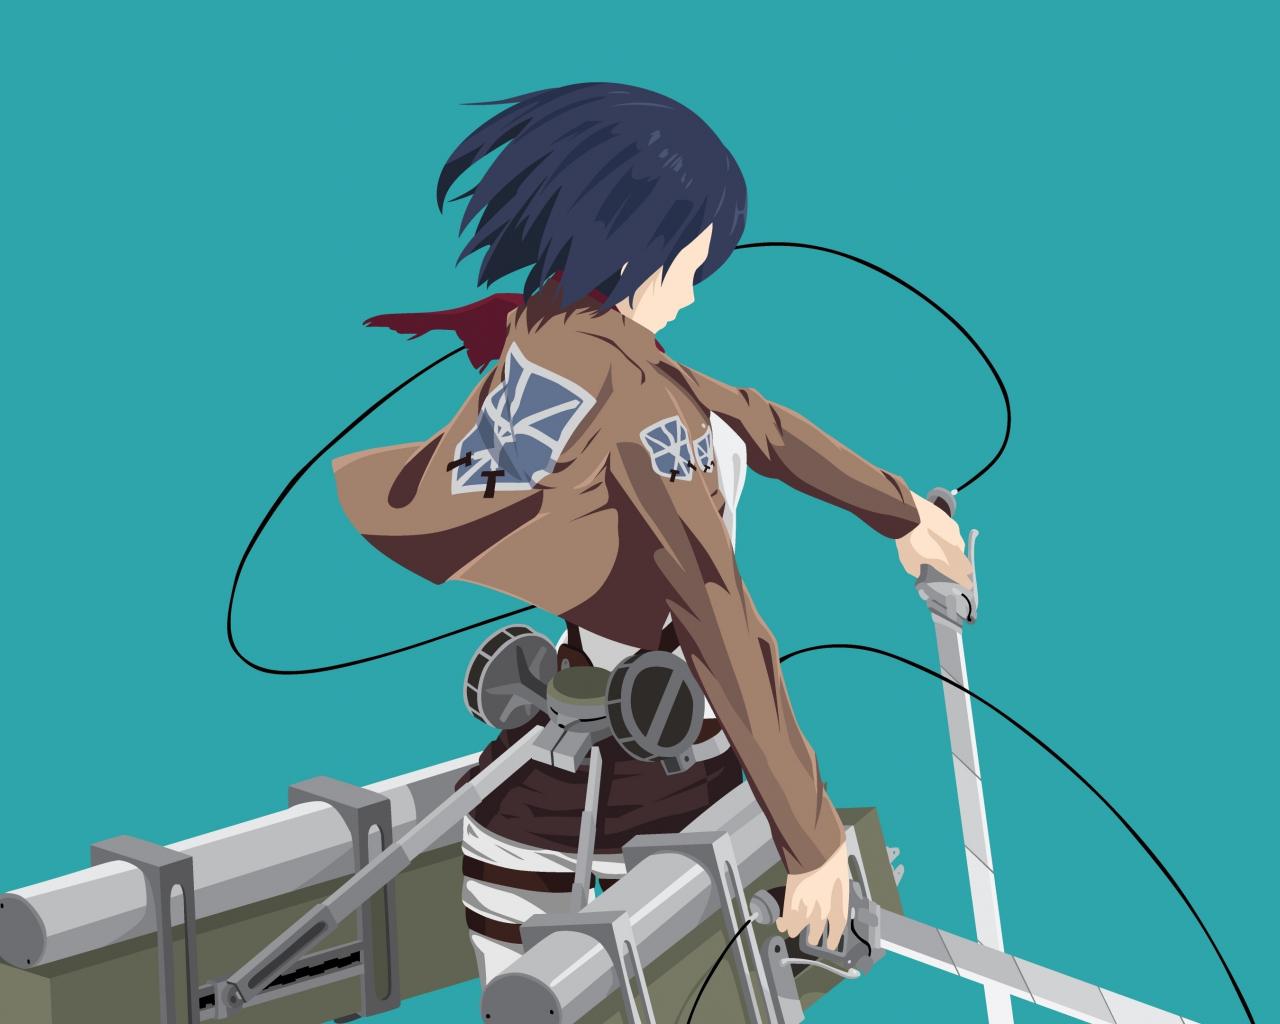 Download 1280x1024 Wallpaper Anime Girl Mikasa Ackerman Minimal